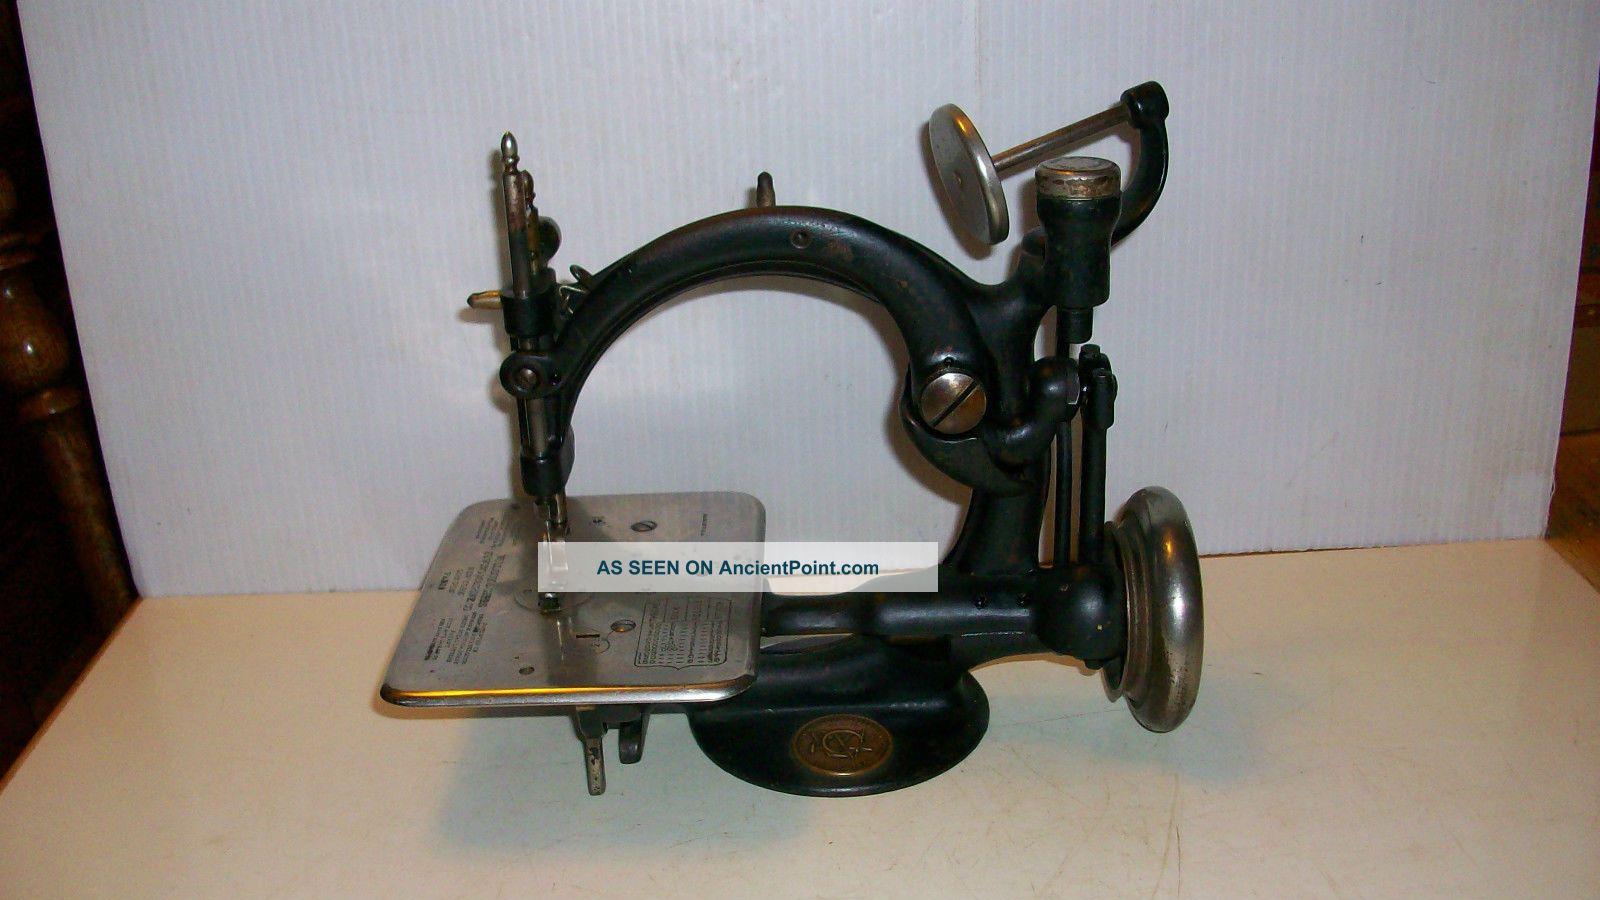 Antique Rare Willcox Gibbs Sewing Machine Works 1883 Carleton Noble Jea Gibbs Sewing Machines photo